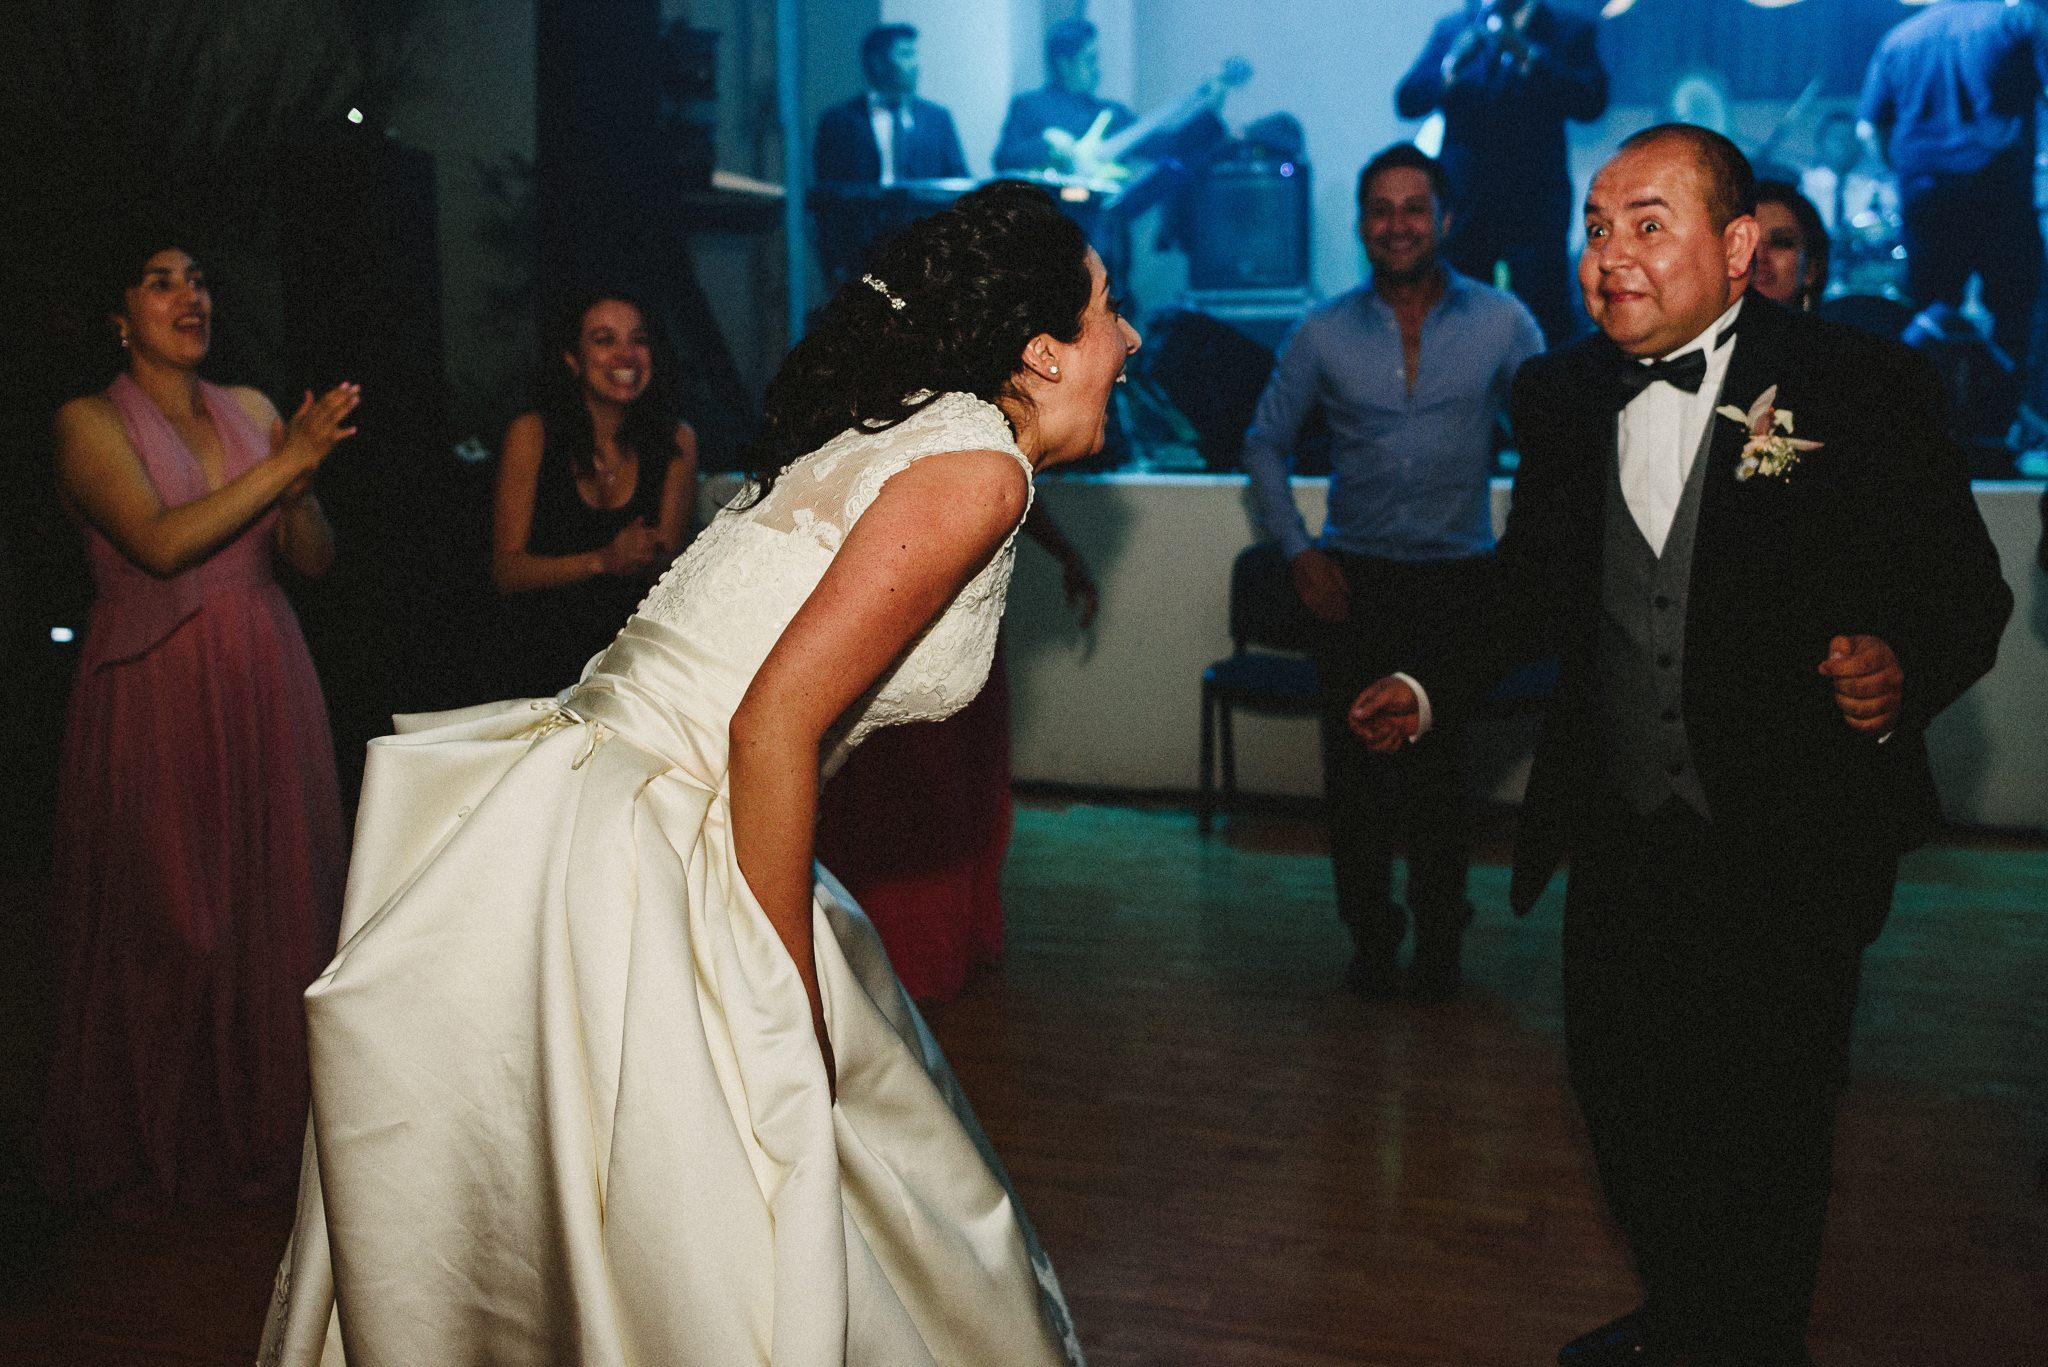 Wedding-Boda-Tulancingo-Hidalgo-Salon-Essenzia-Luis-Houdin-87-film